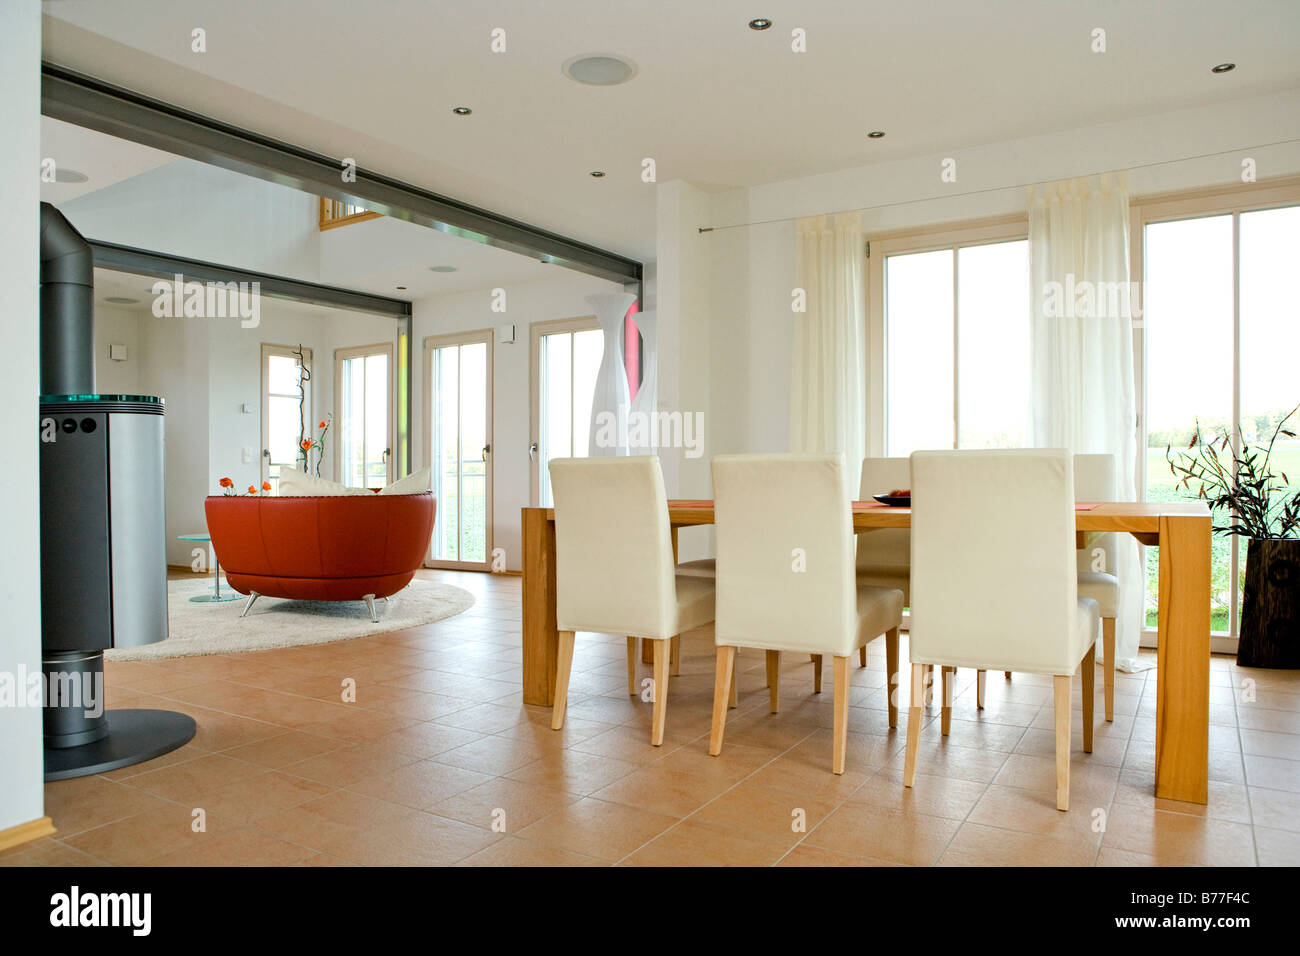 Modernes Esszimmer, Modern Dining Room